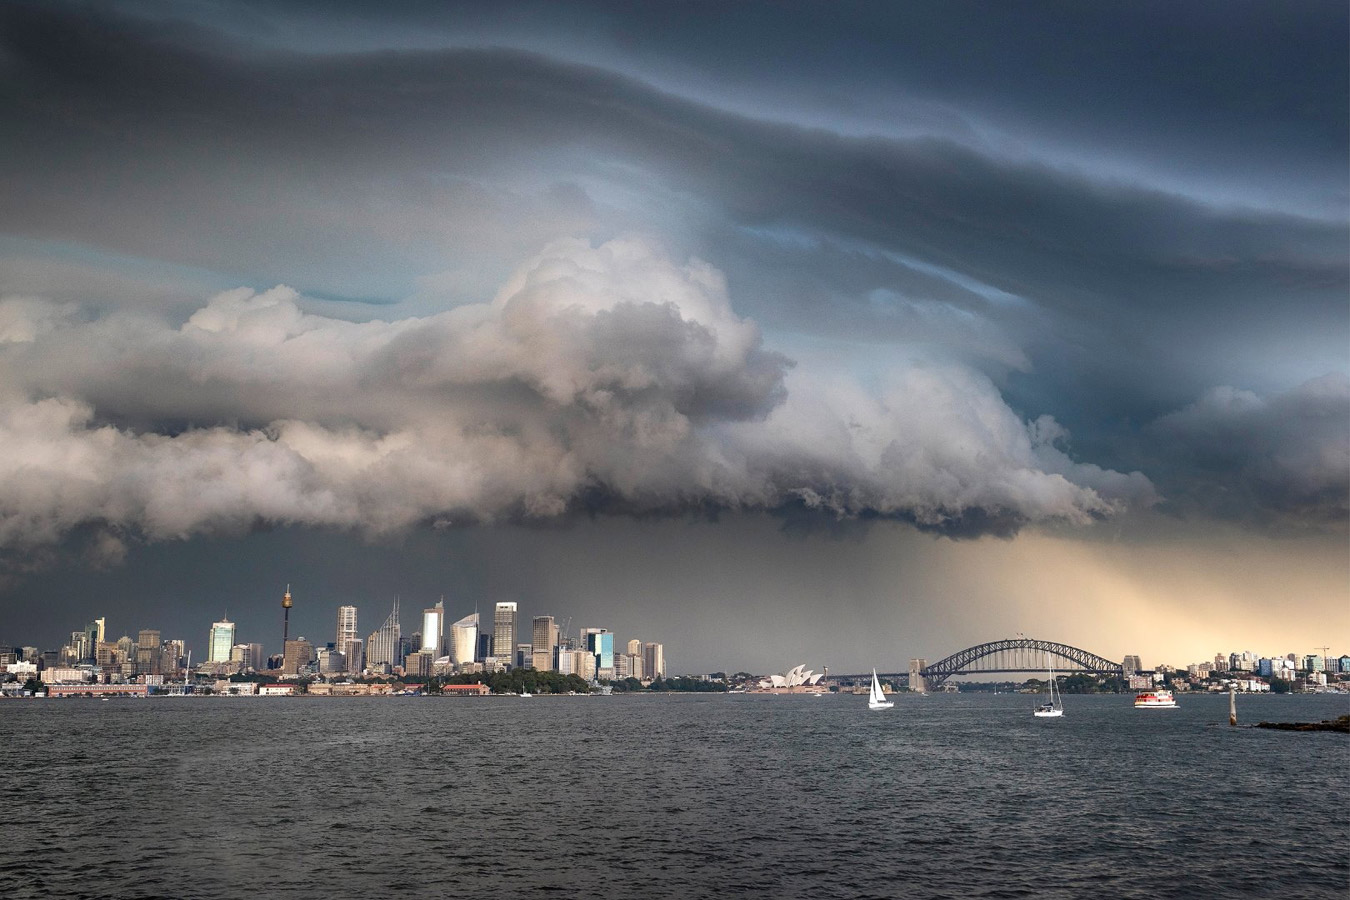 Ники Рочуссен / Nicky Rochussen, Фотоконкурс RMetS / RPS Weather